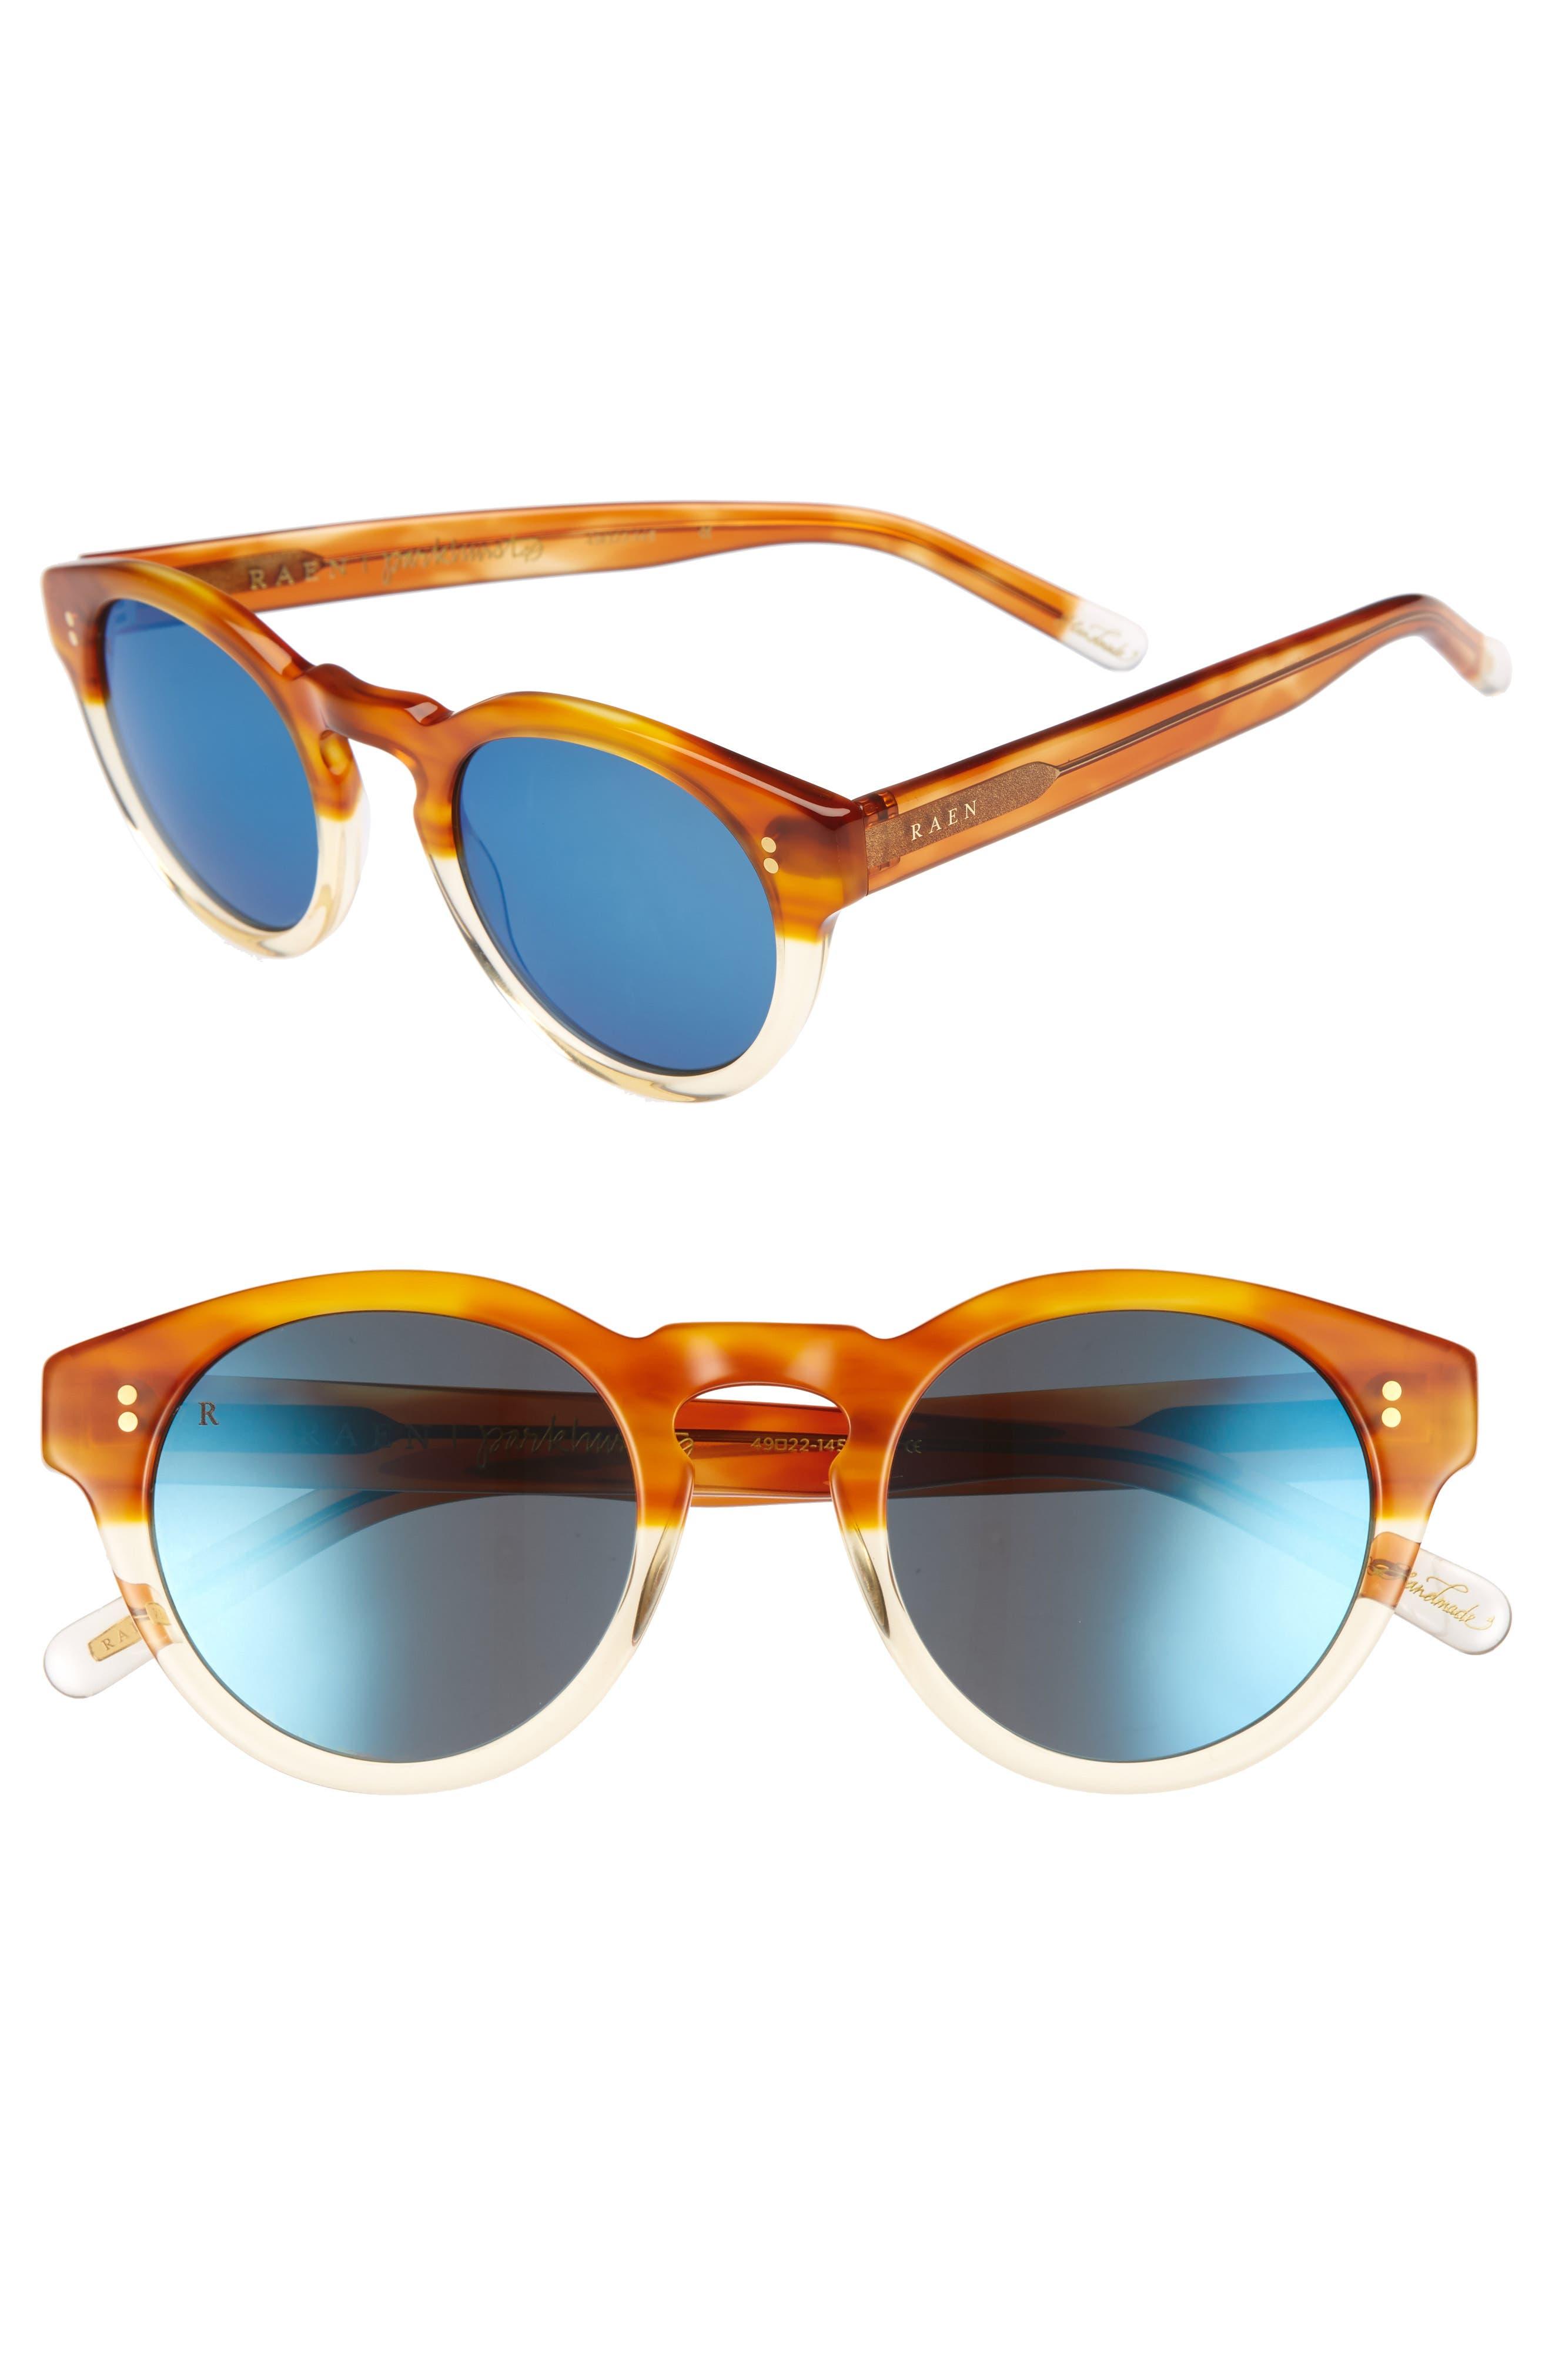 Parkhurst 49mm Sunglasses,                         Main,                         color, Honey Havana/ Blue Mirror